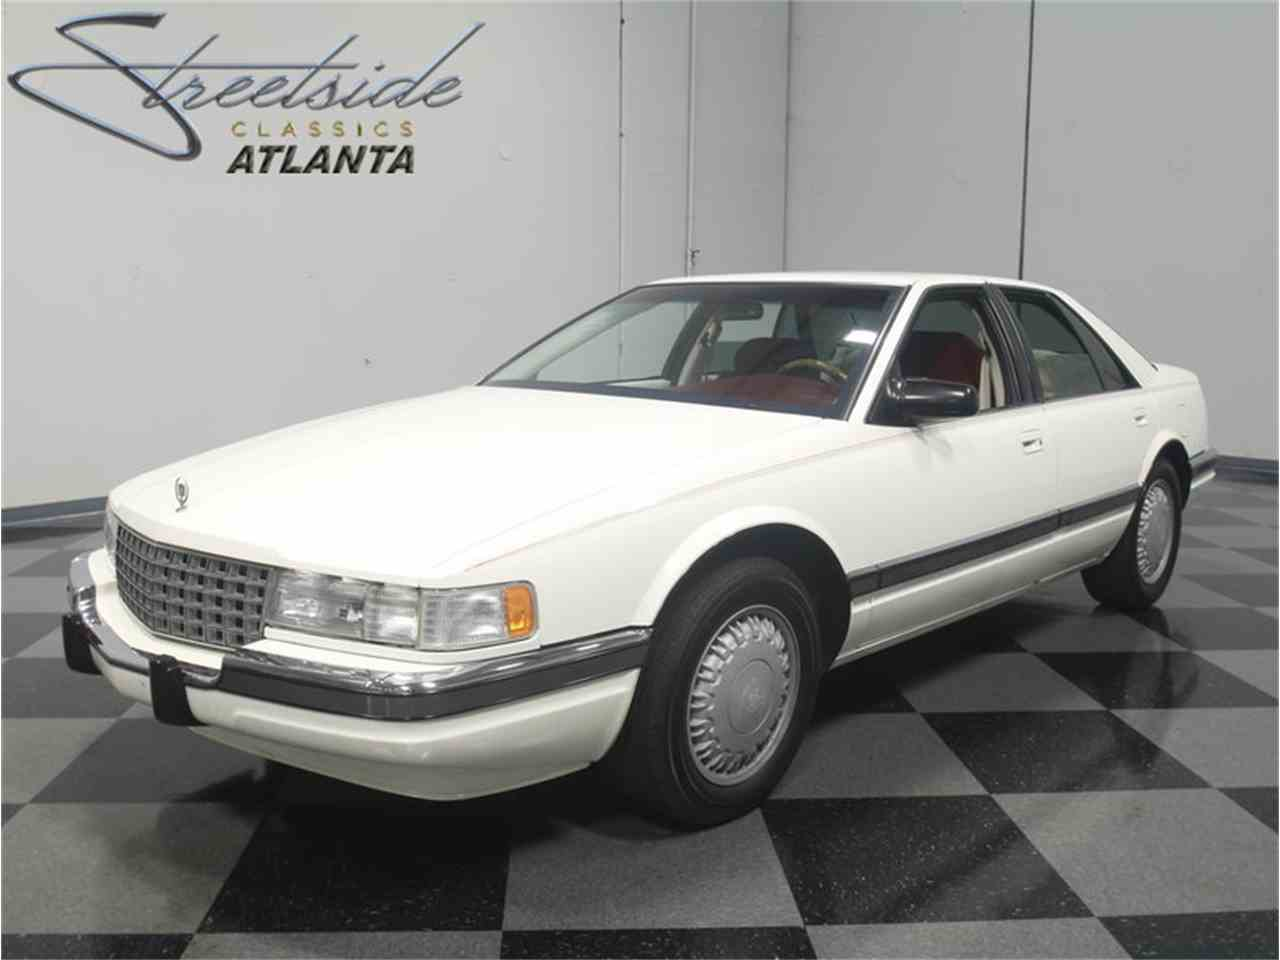 1992 Cadillac Seville for Sale - CC-1002457